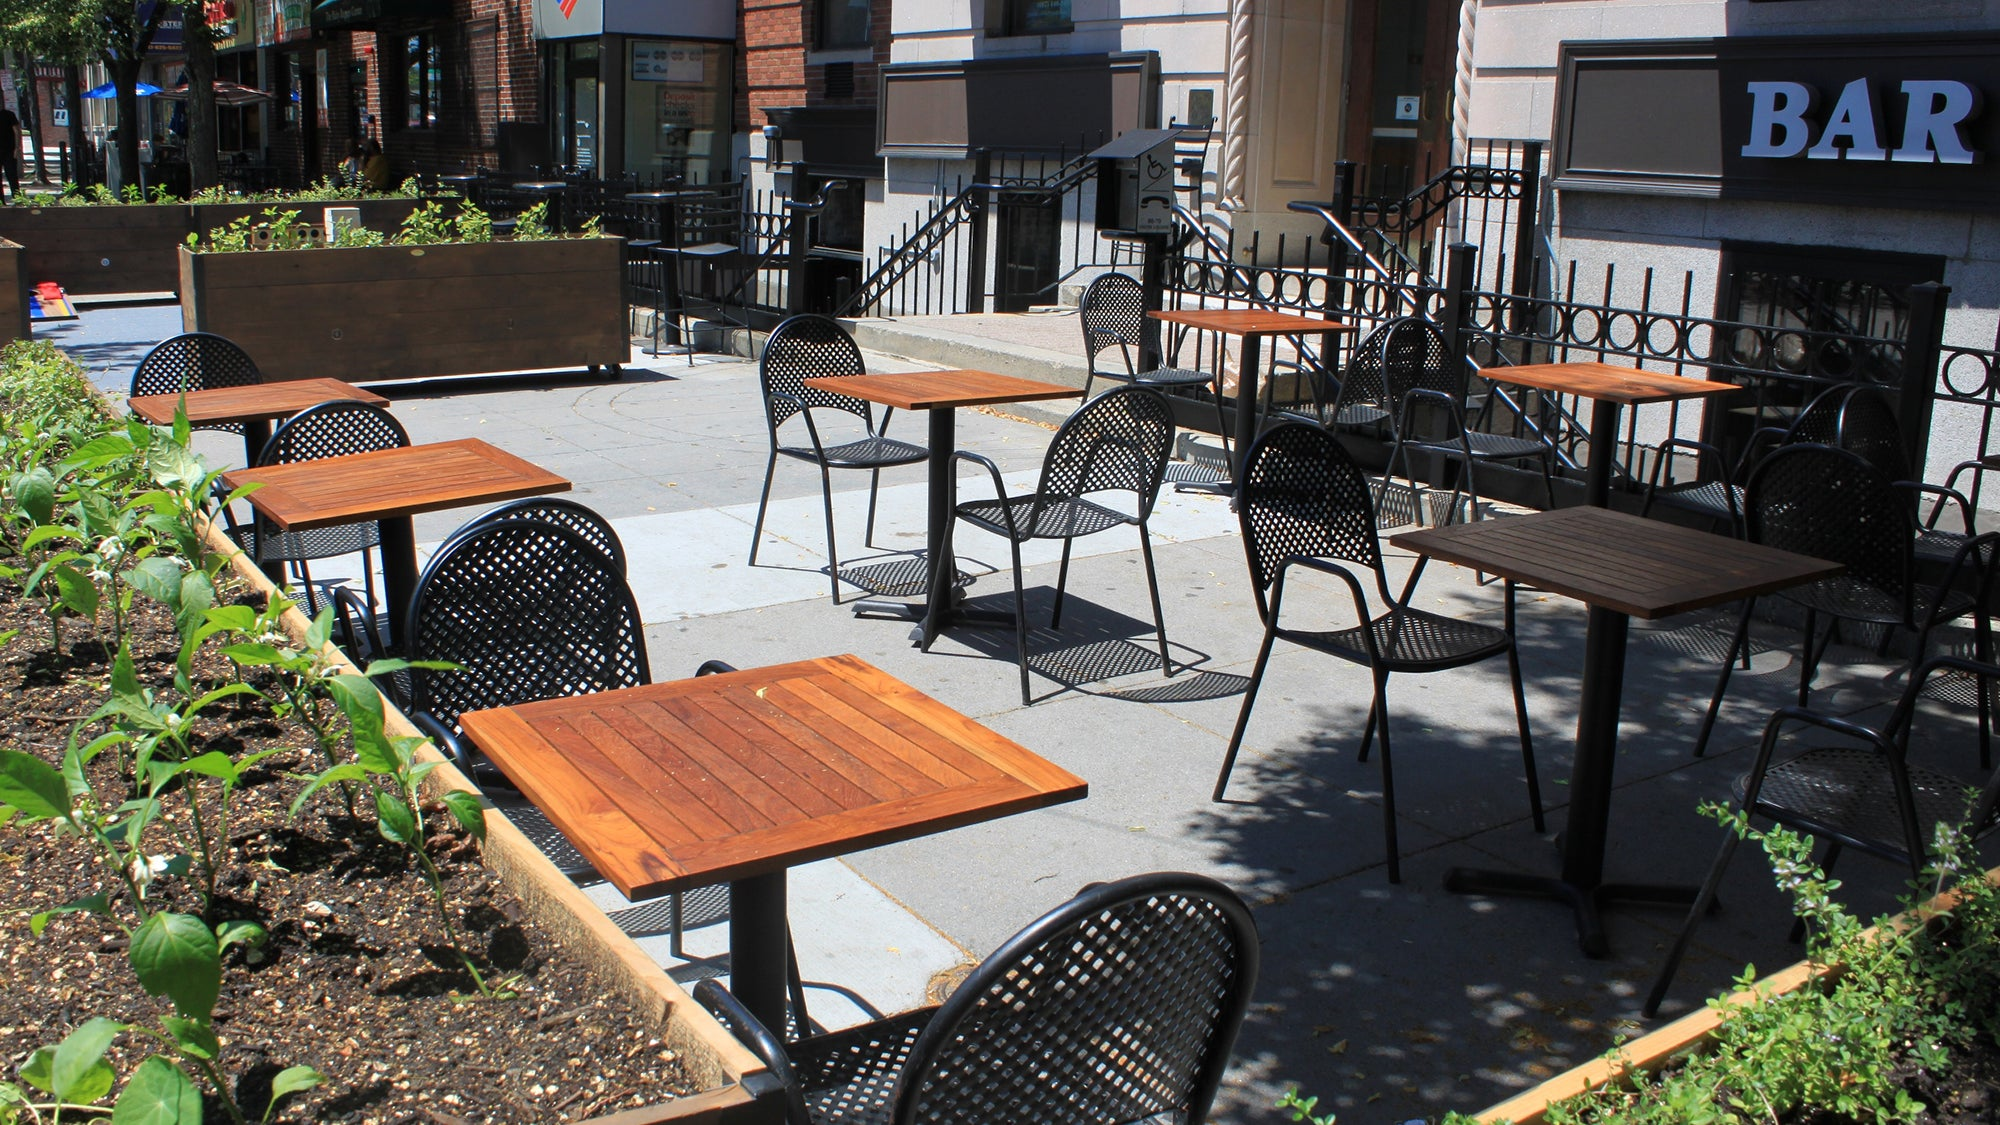 Brass Union's patio in 2018